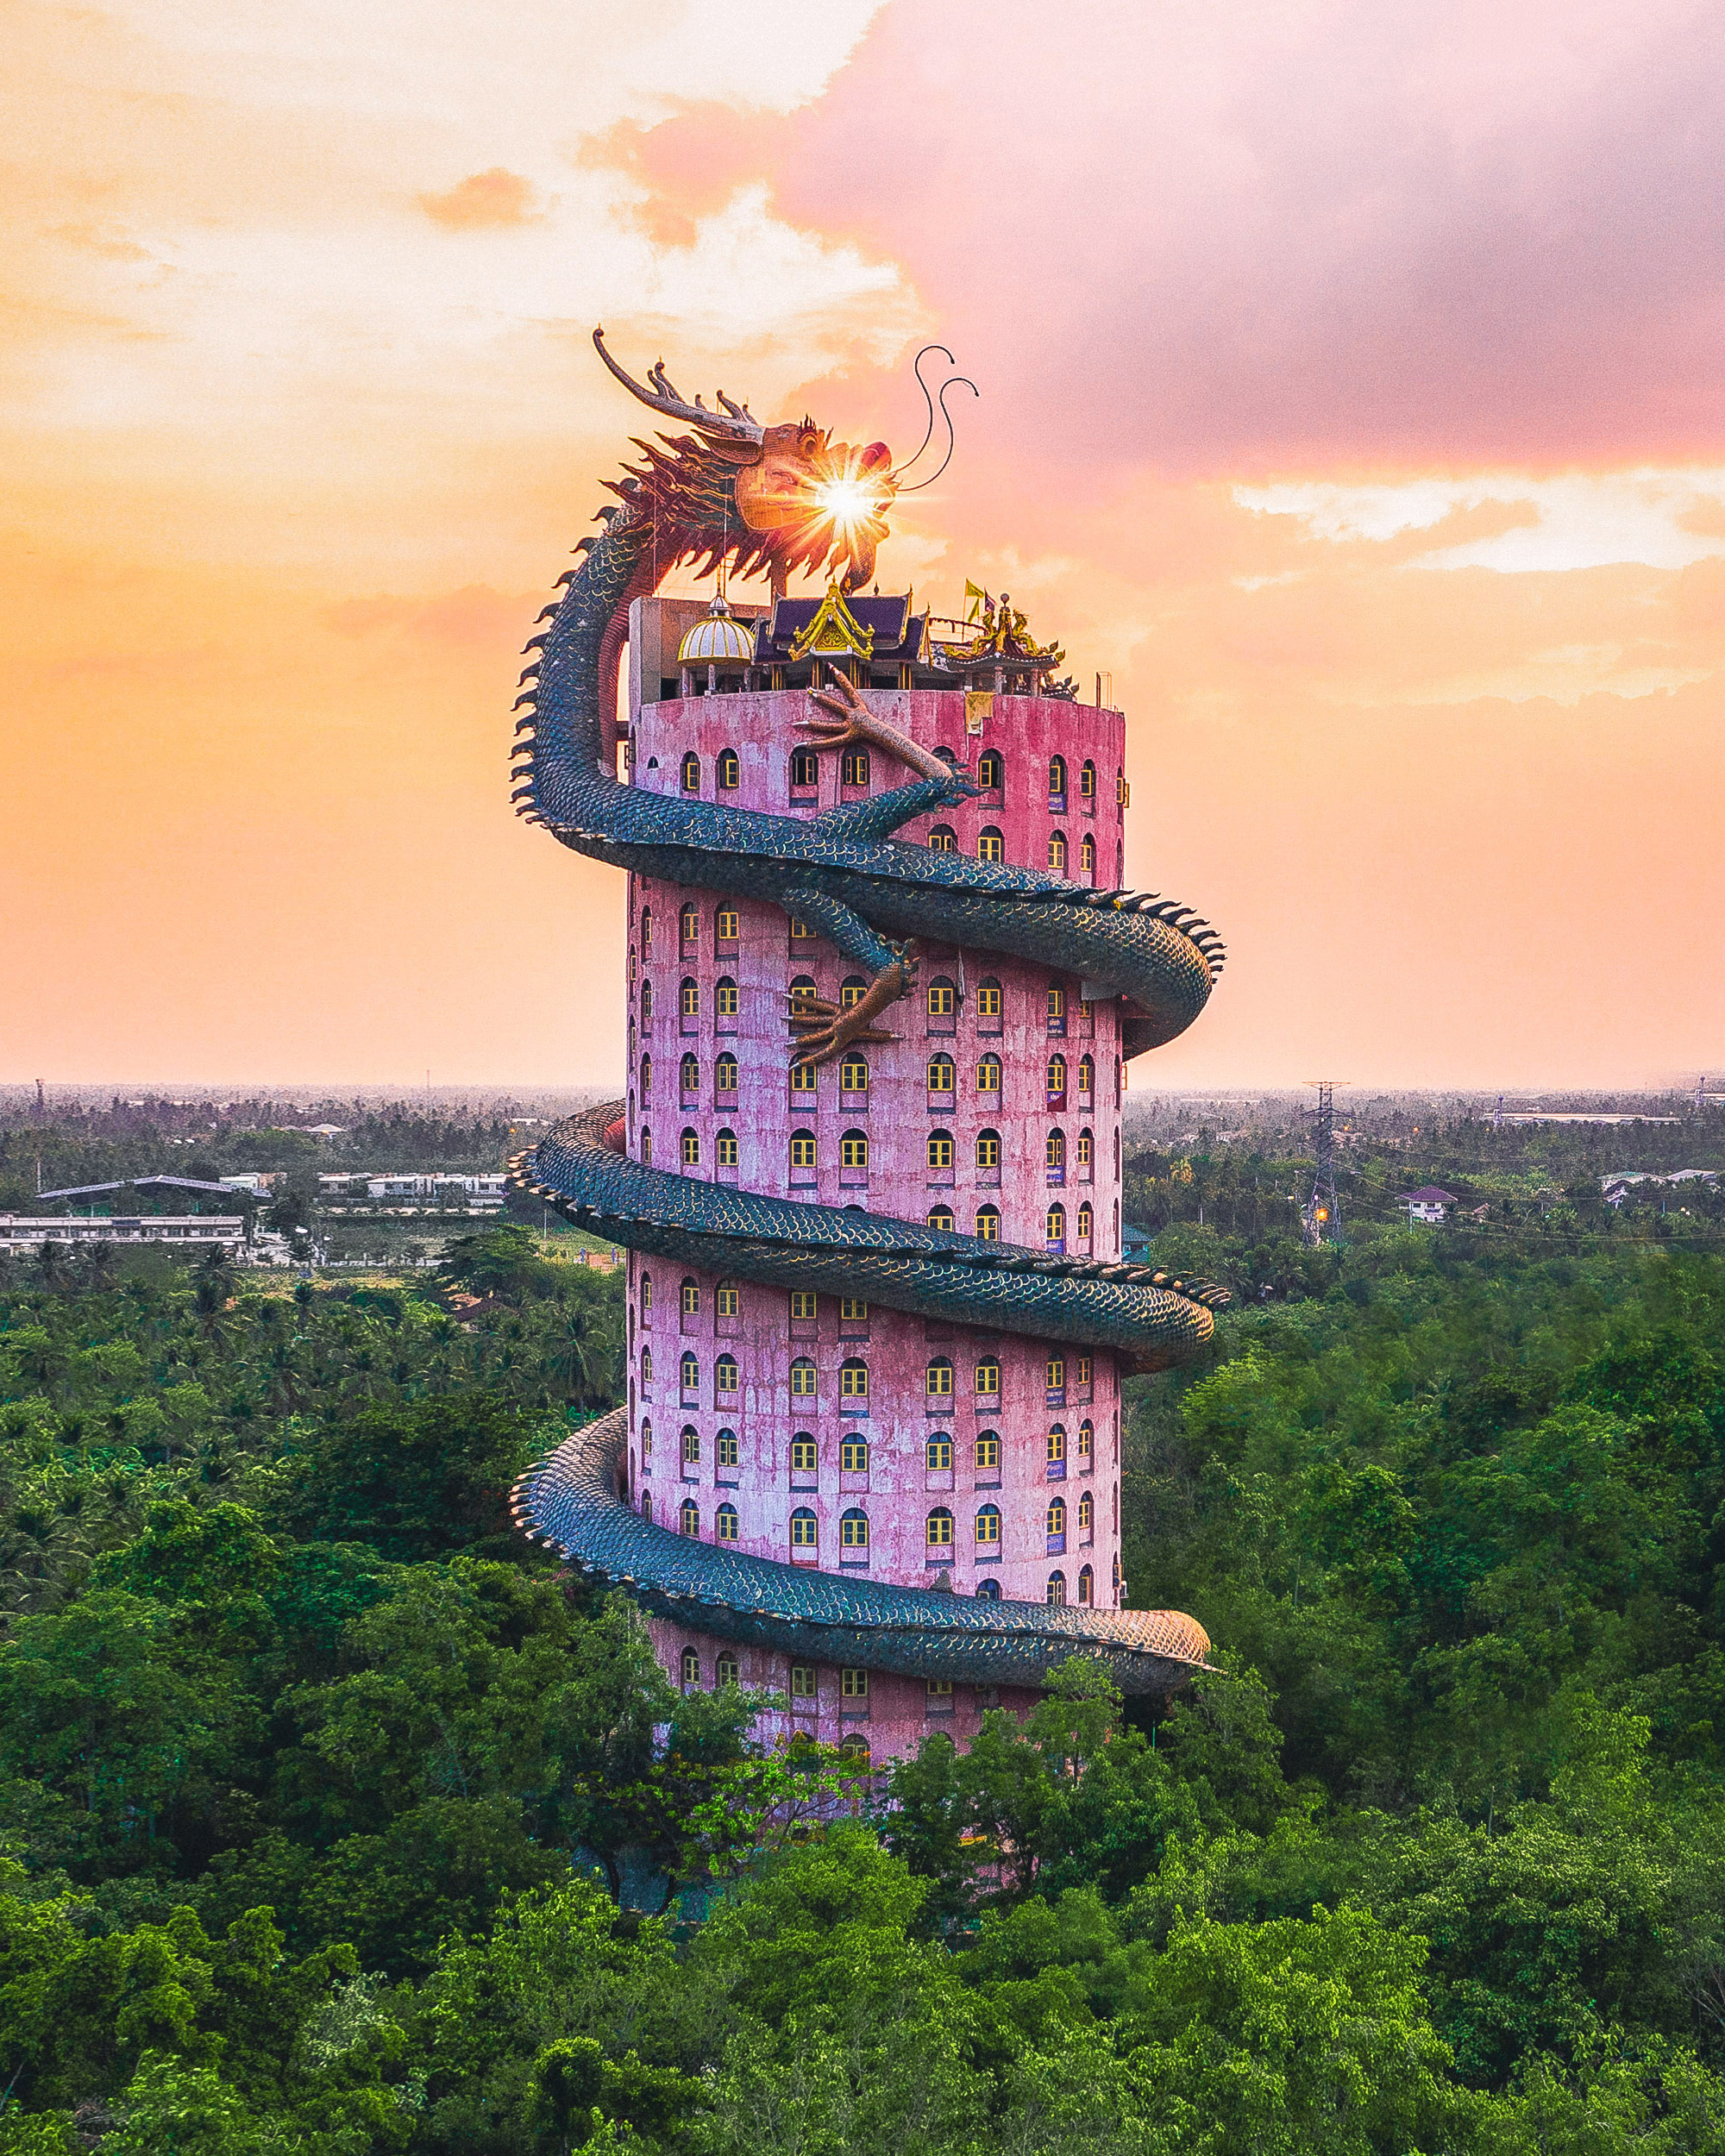 Sunset at Wat Samphran, a.k.a. the Dragon Temple.